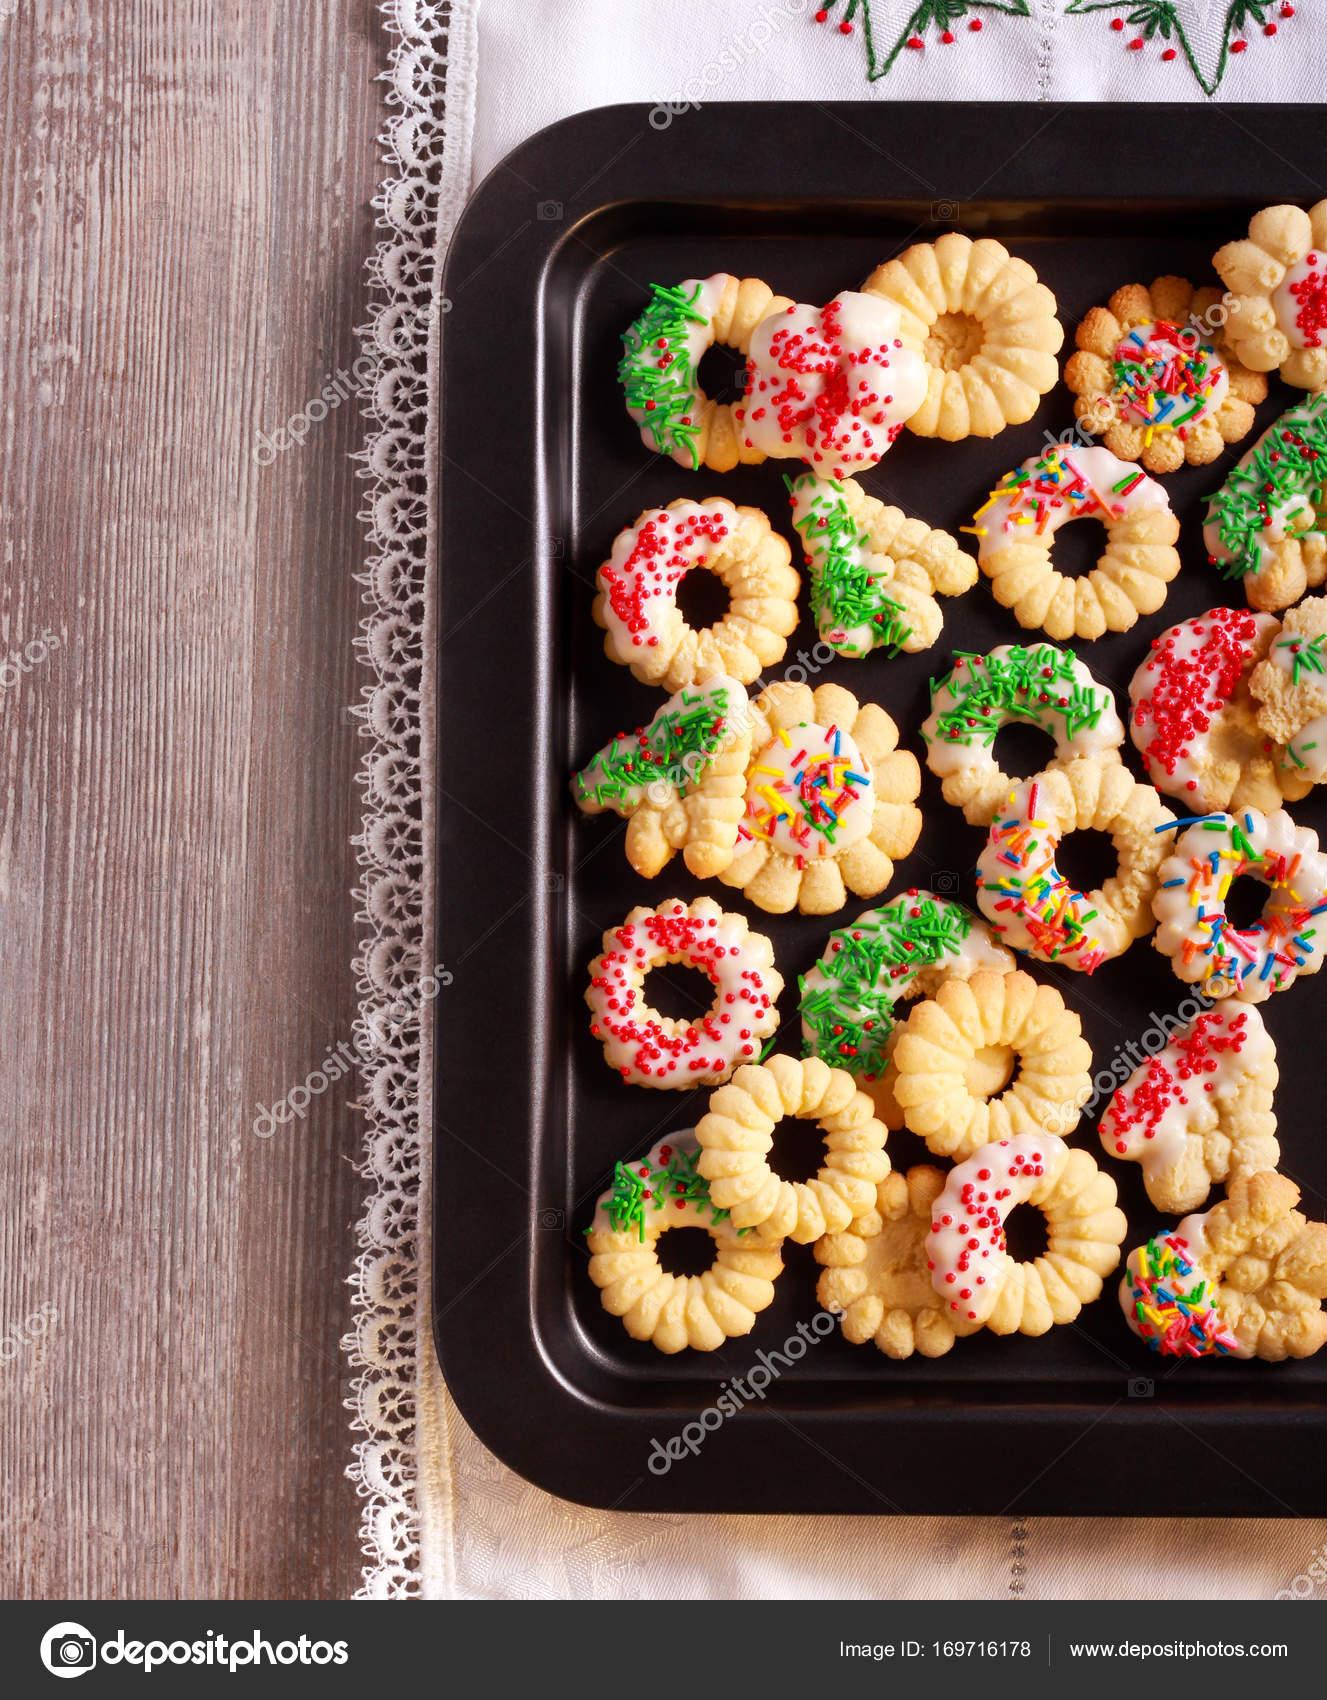 Urlaub-Spritz-Kekse mit Zuckerguss — Stockfoto © manyakotic #169716178